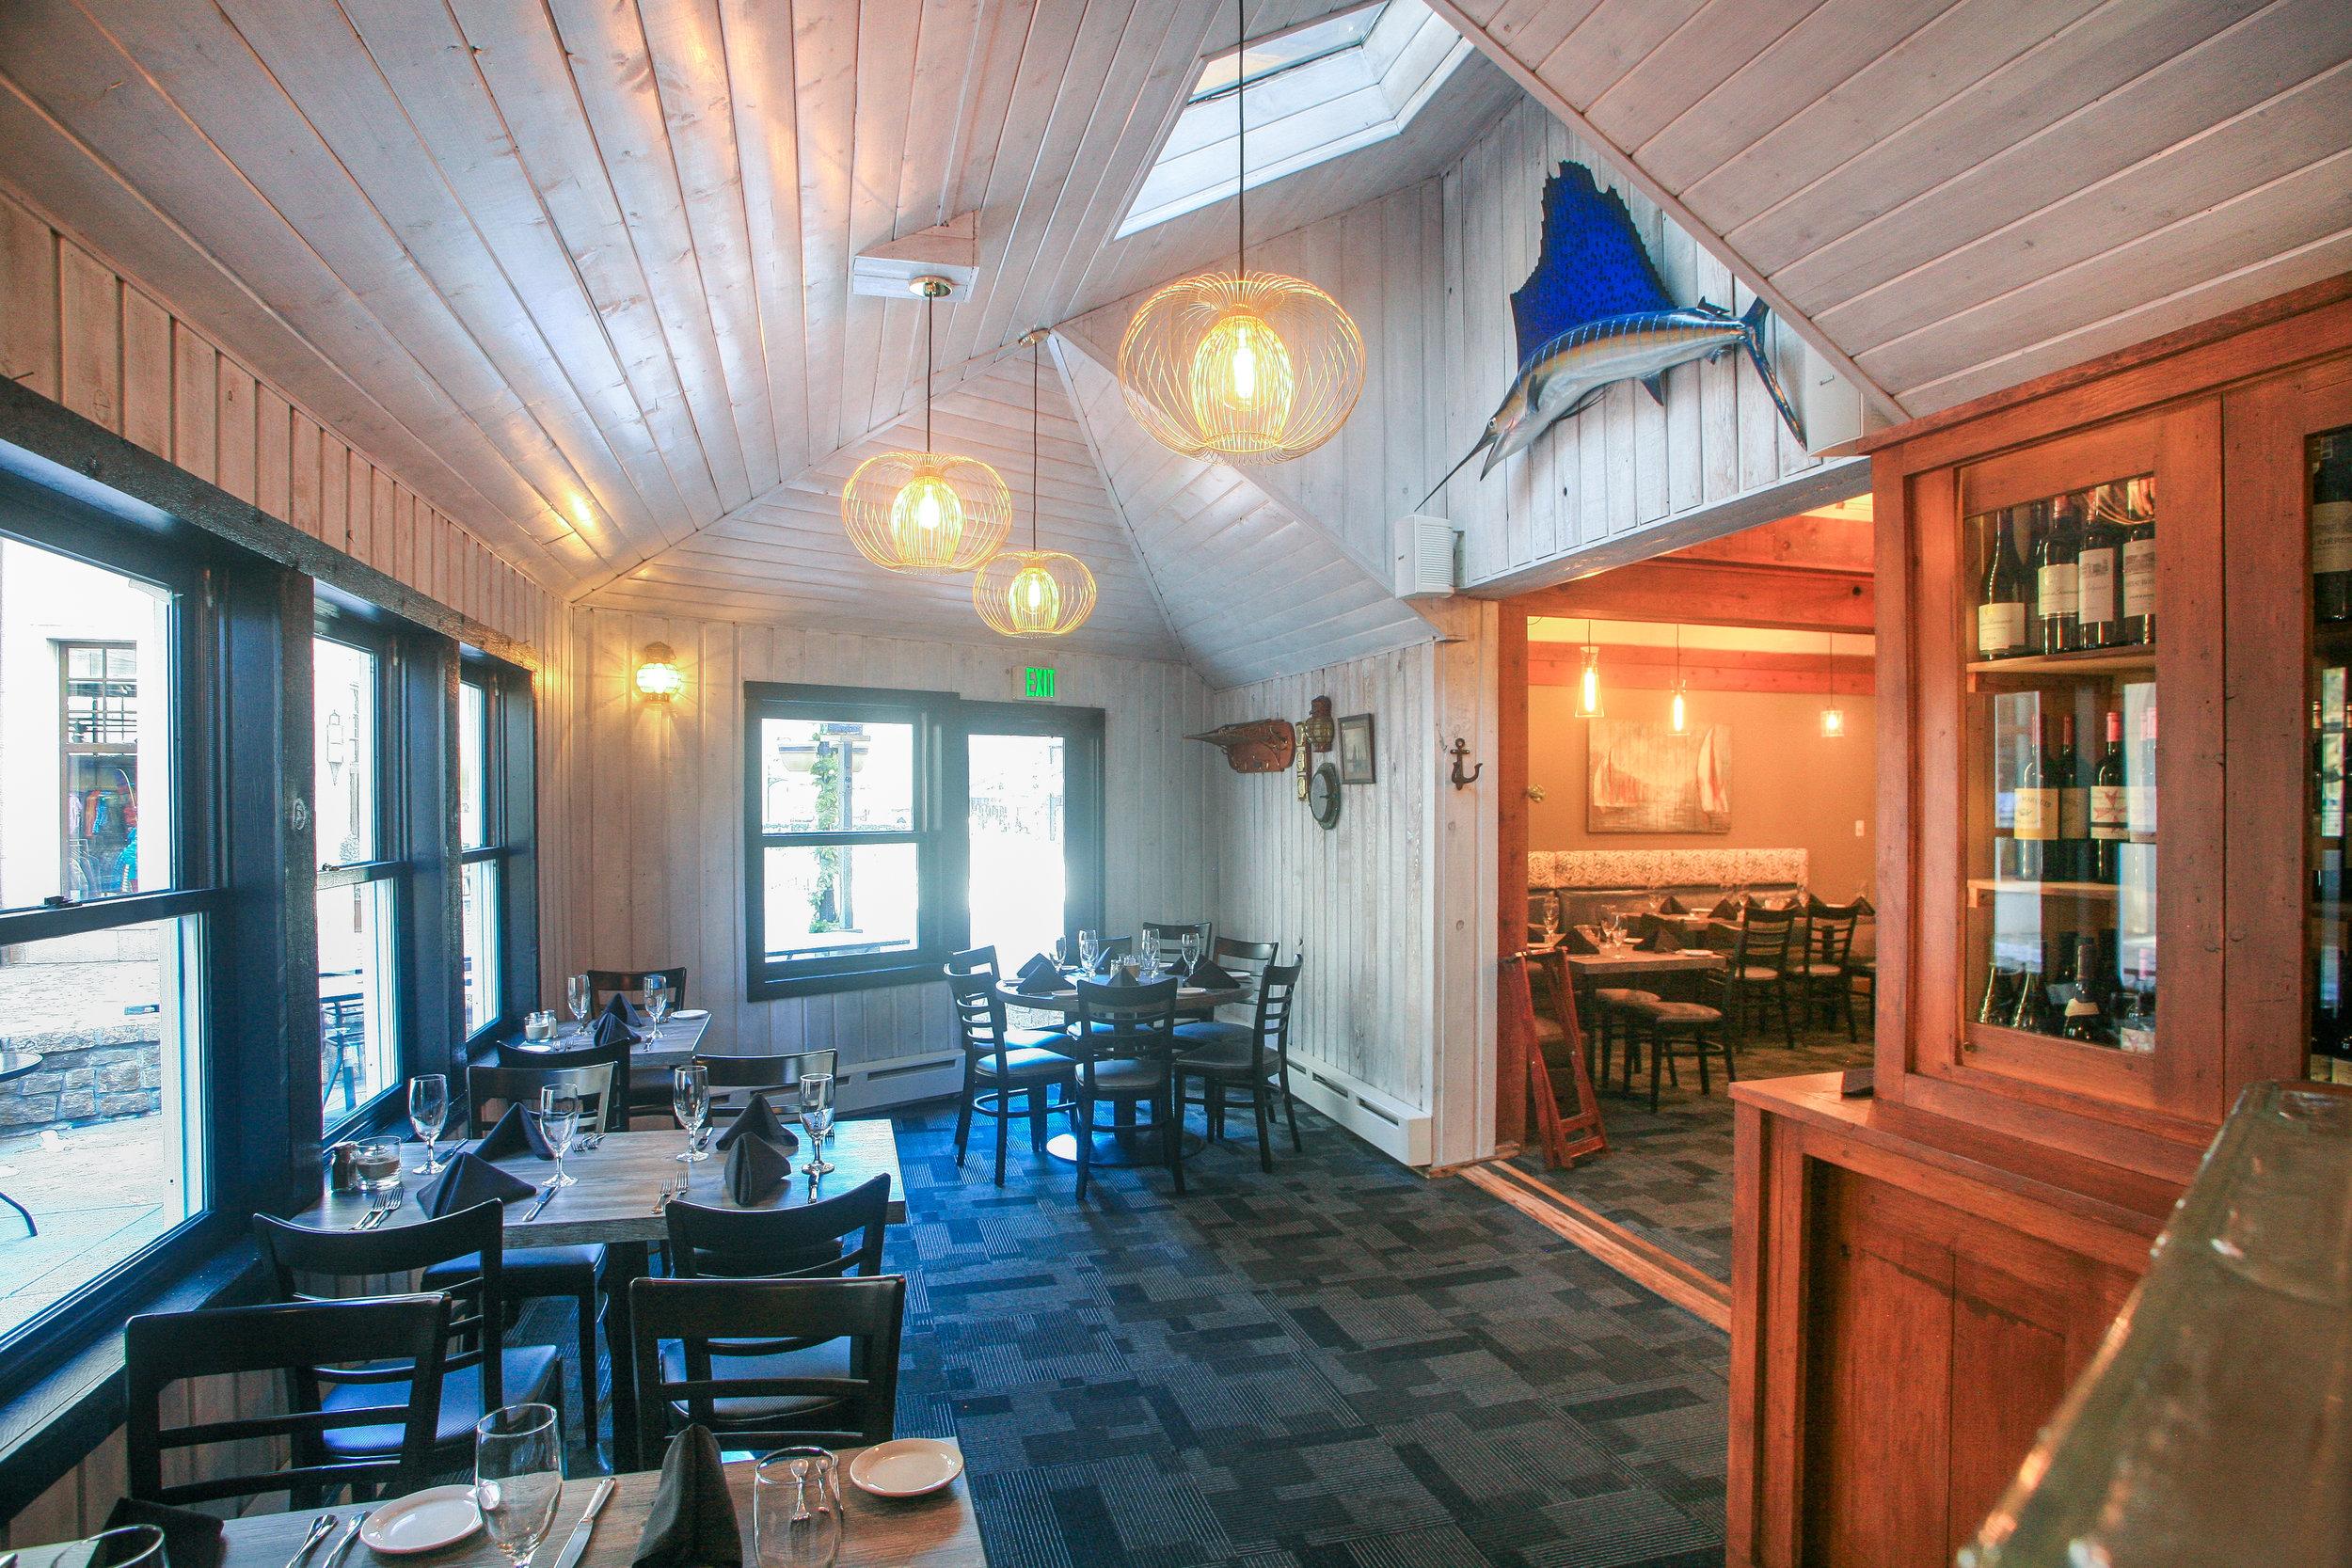 Montauk Vail Dining Room Entry